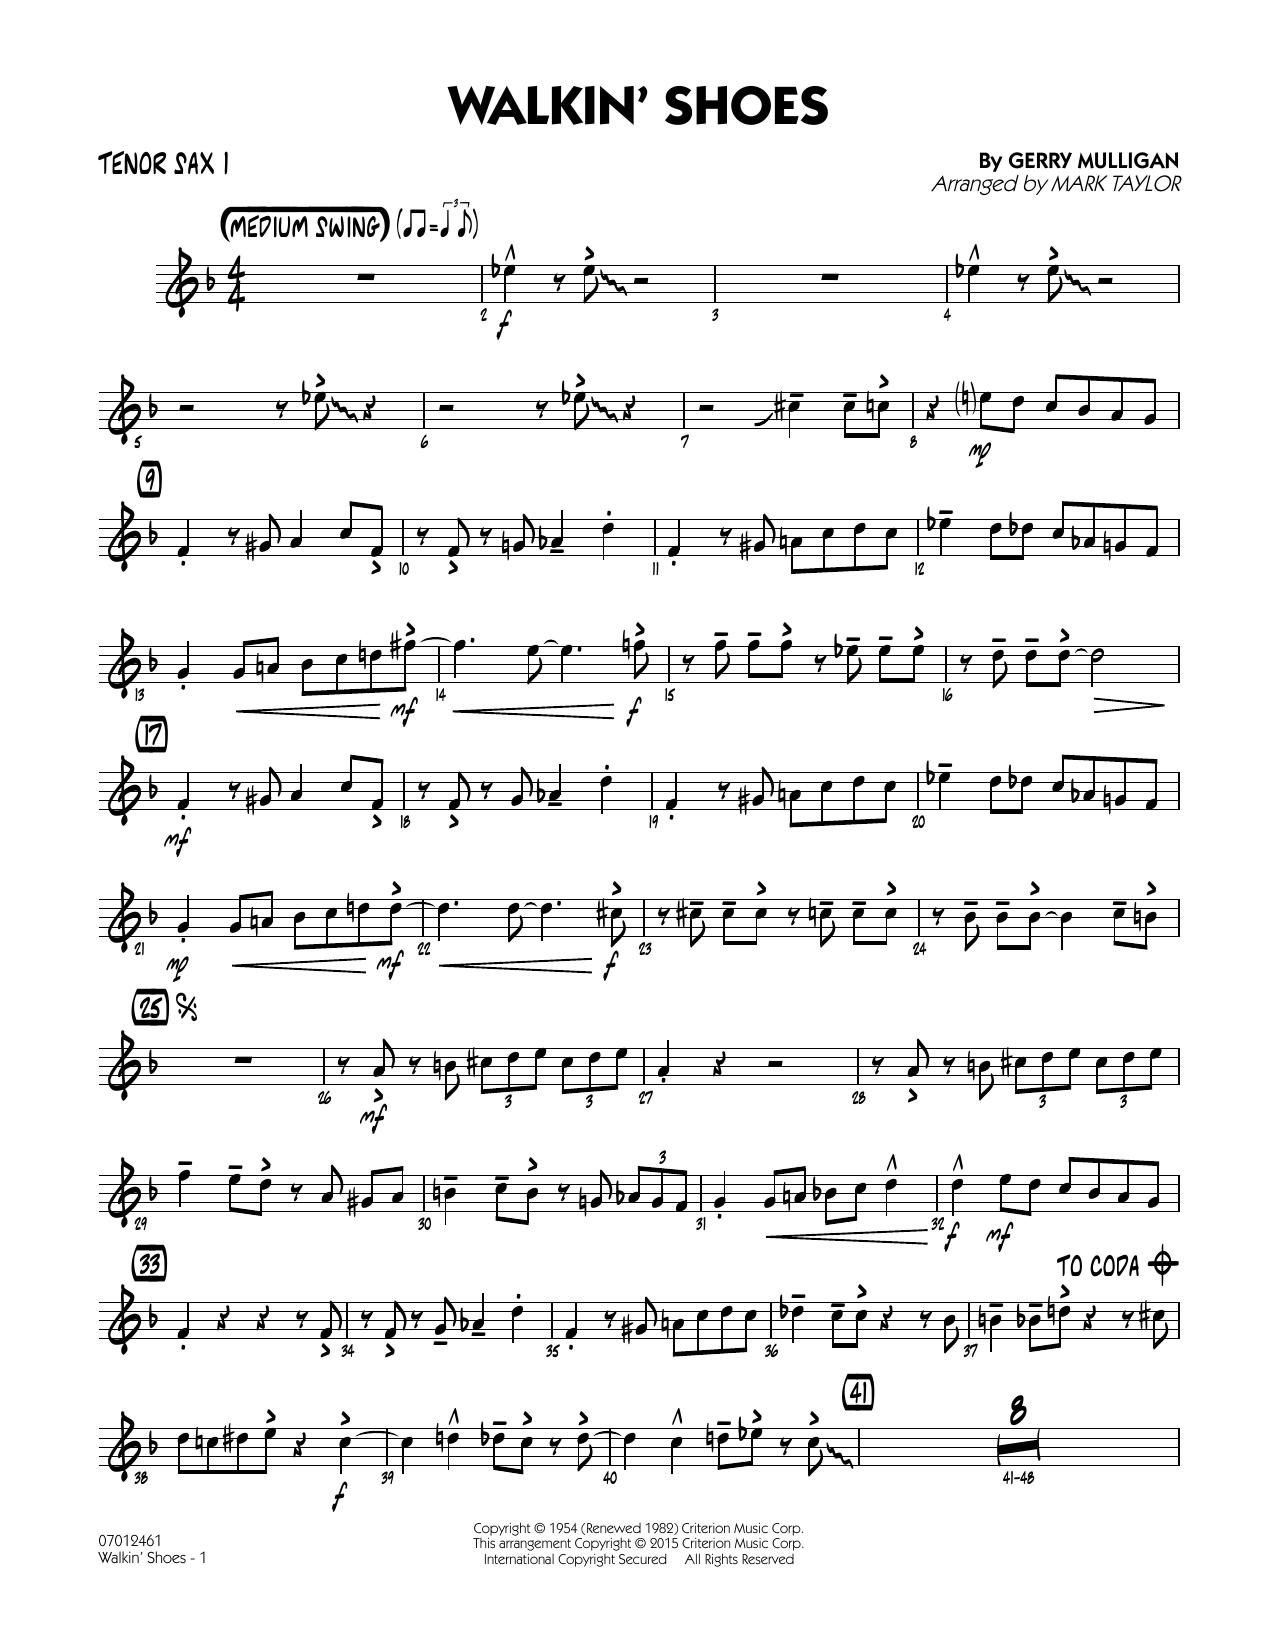 Mark Taylor Walkin' Shoes - Tenor Sax 1 sheet music notes and chords. Download Printable PDF.